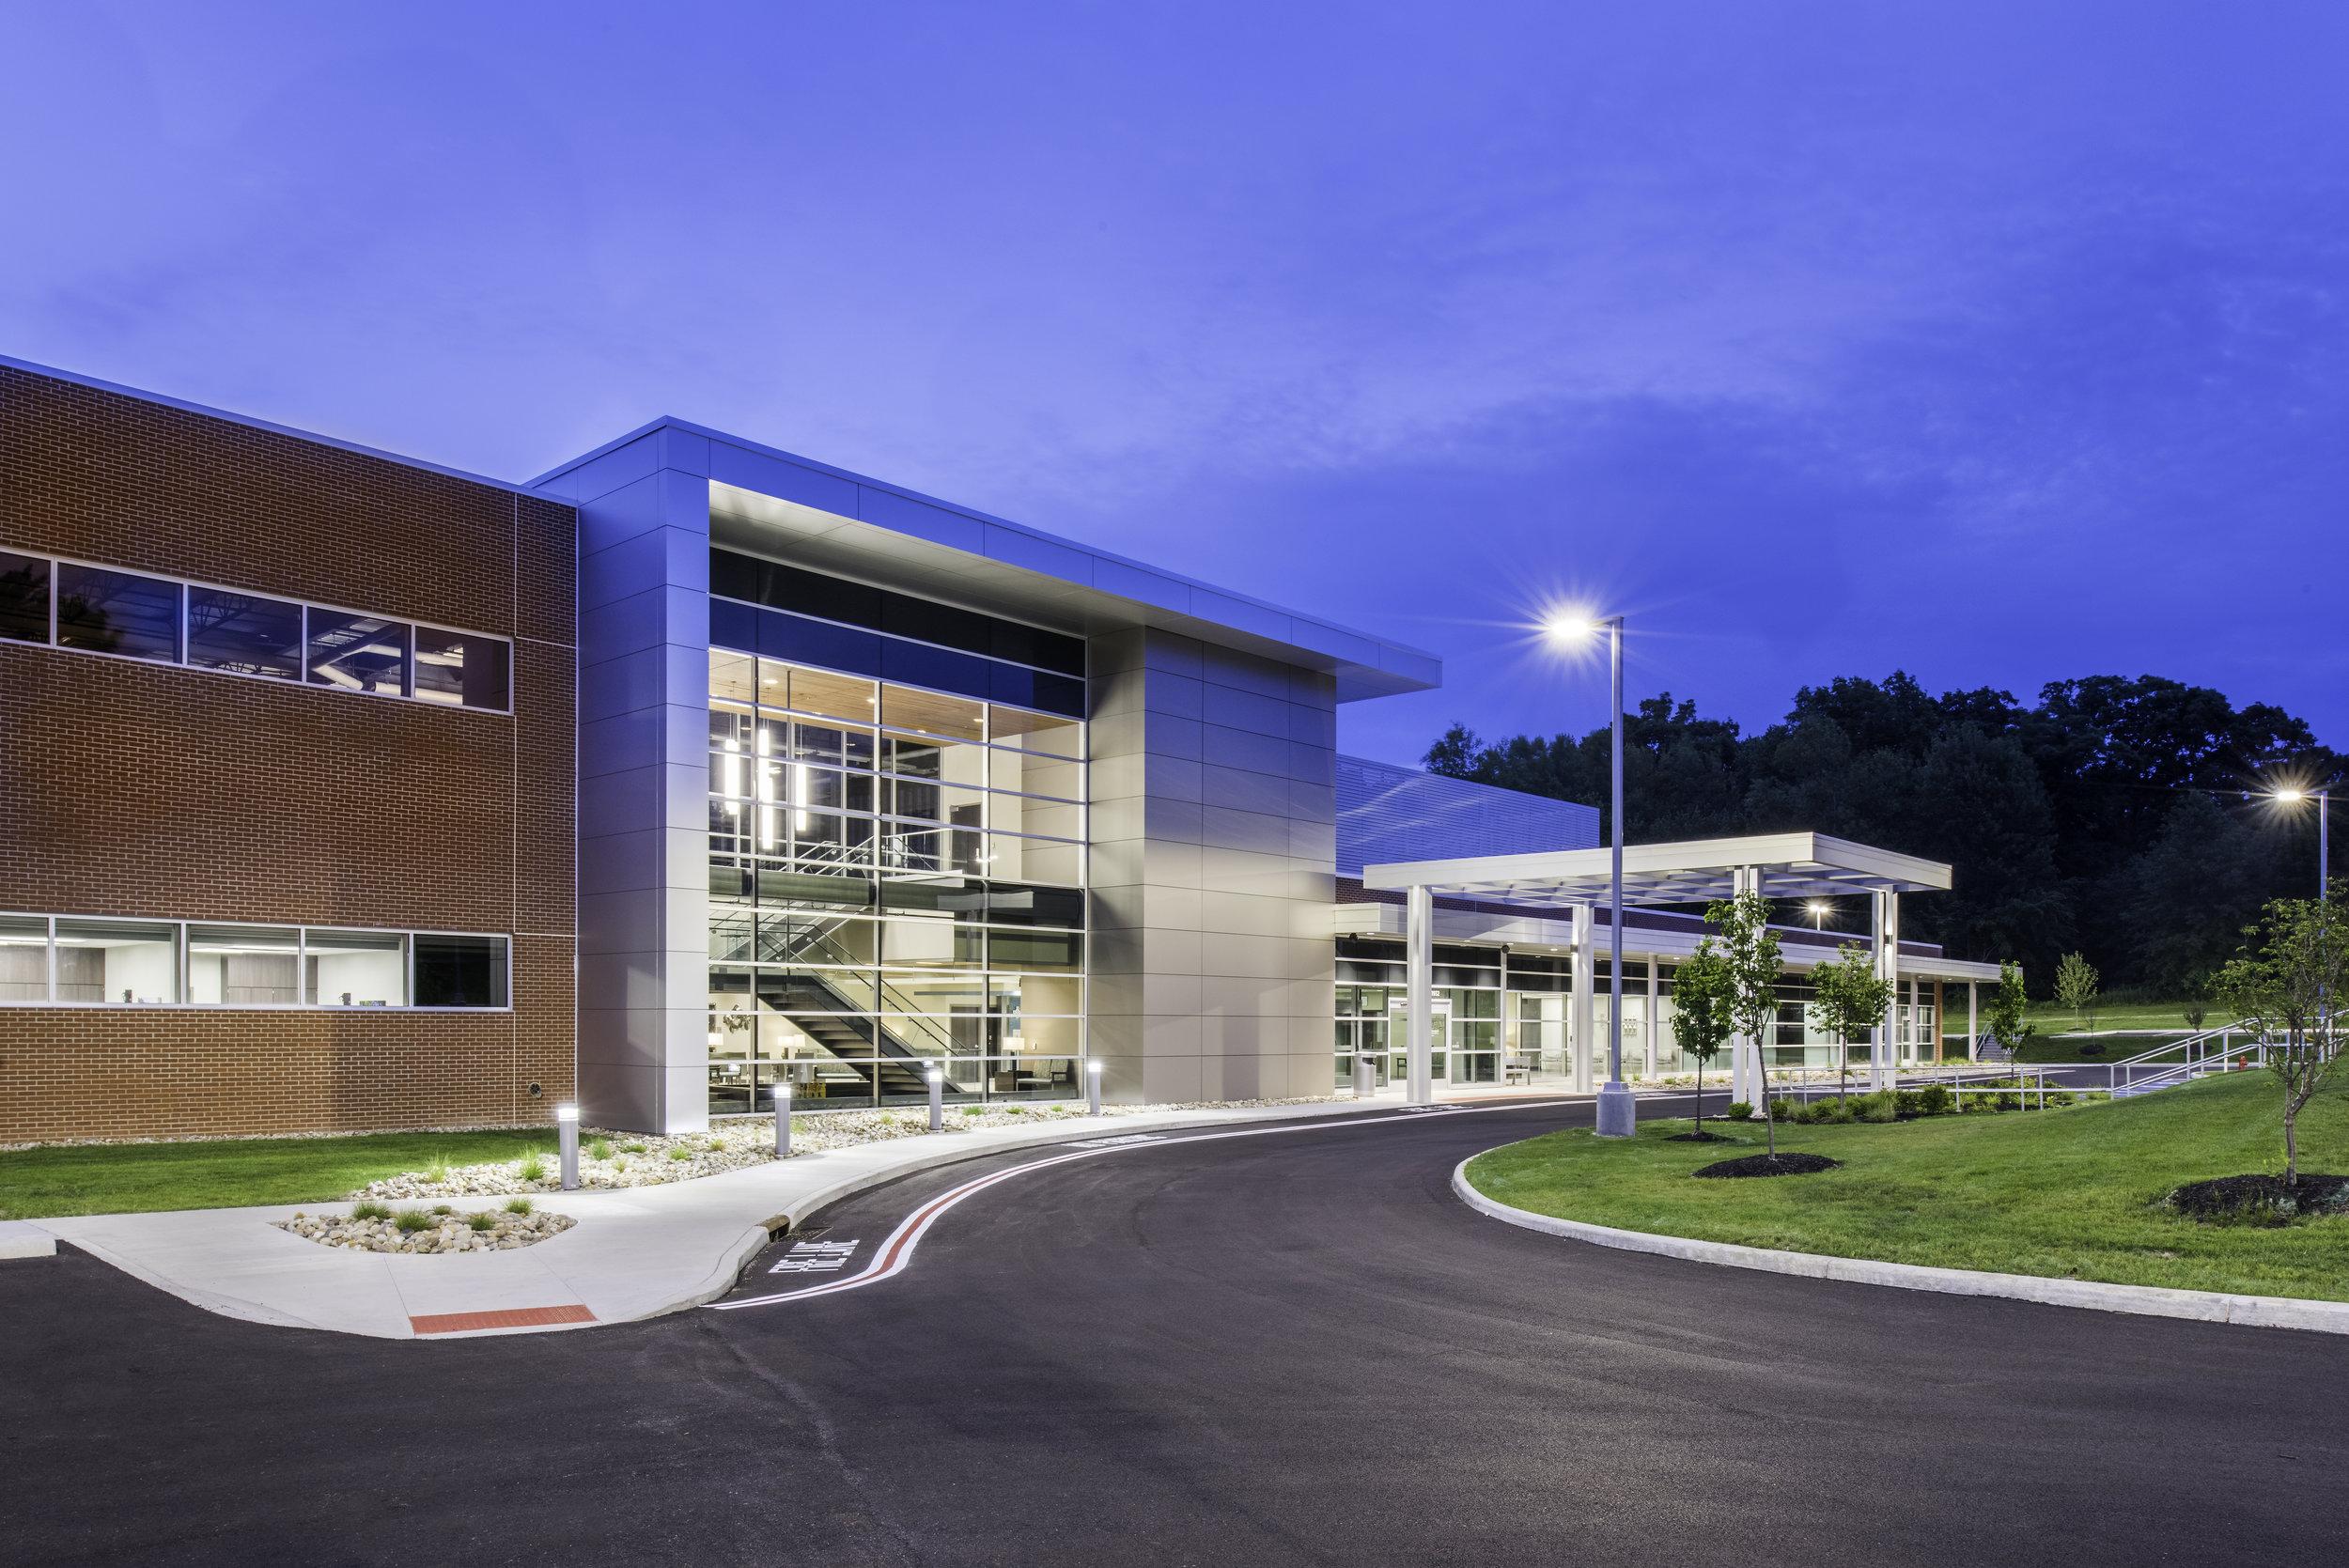 Howland Medical Center - WARREN, OH